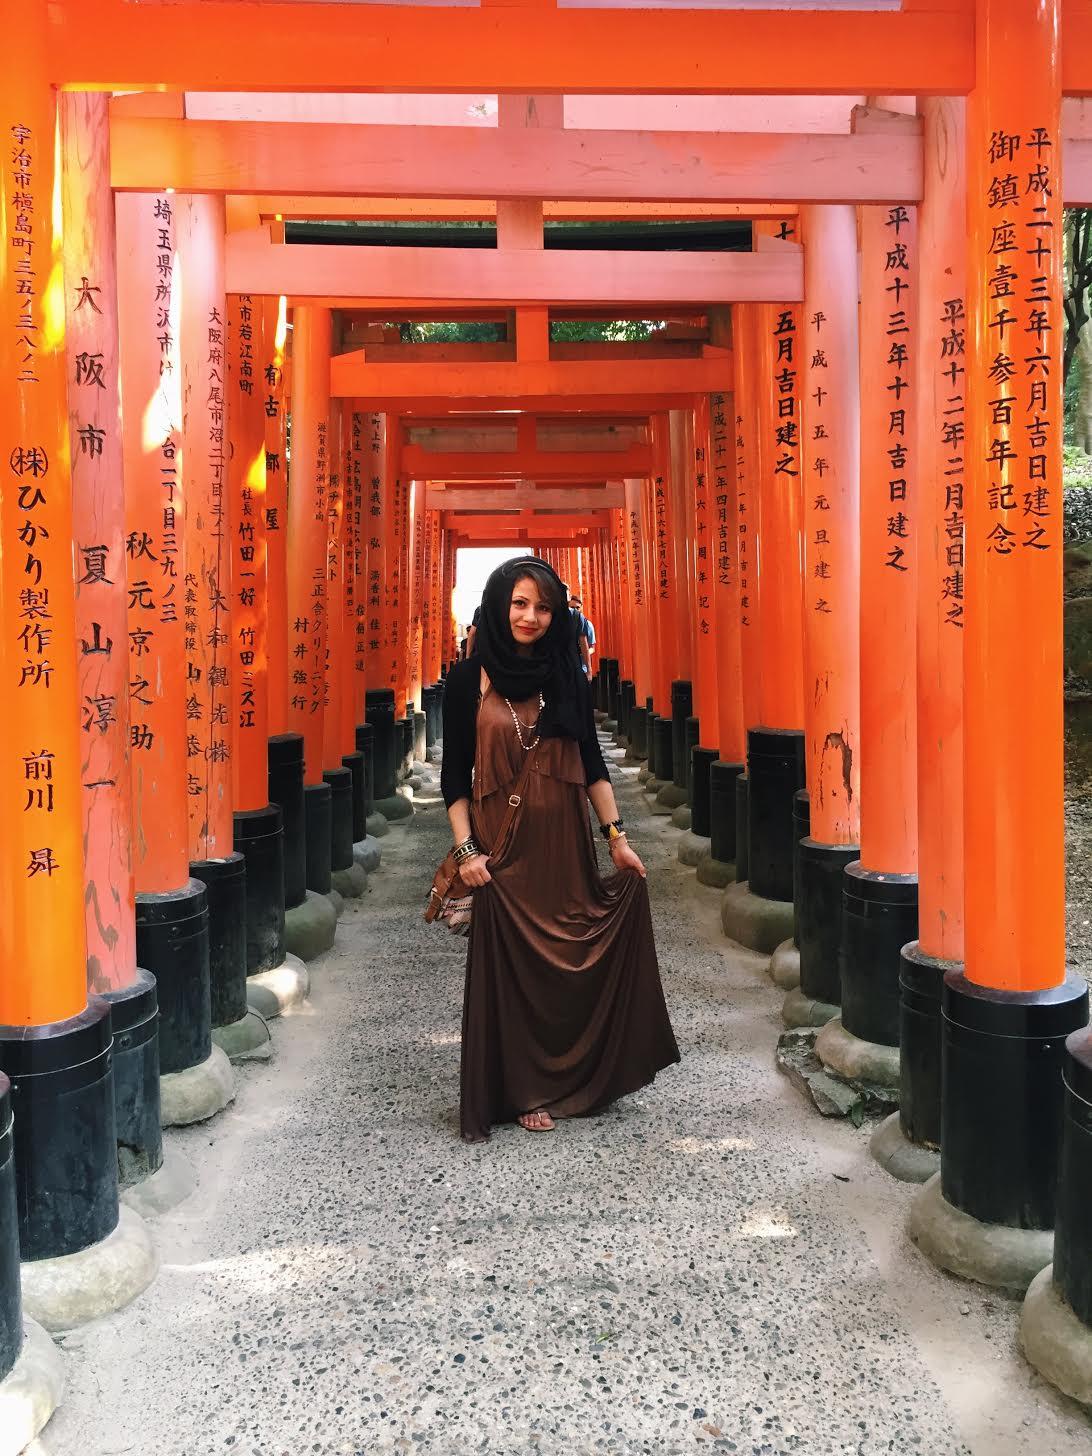 Muslim-travel-tips-Kyoto-Fushimi-Inari-Shrine-Trail.jpg